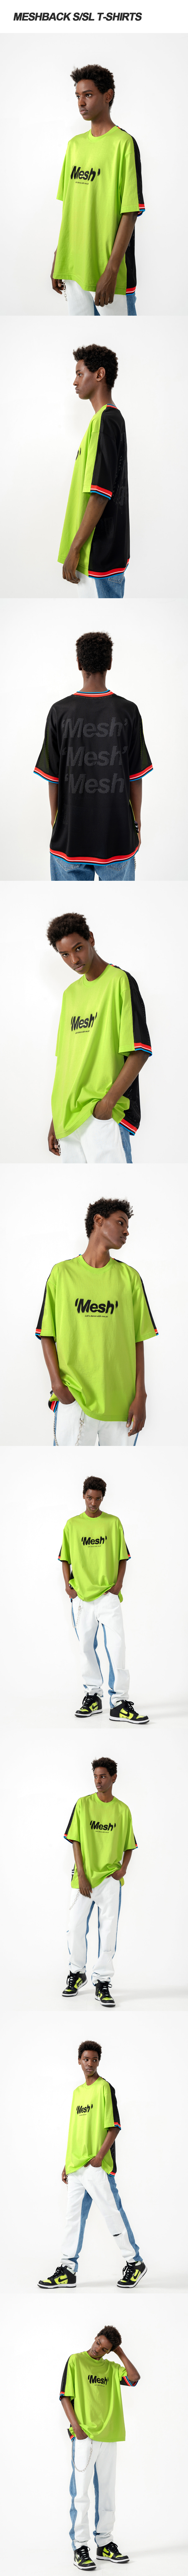 MESHBACK S/SL T-SHIRTS